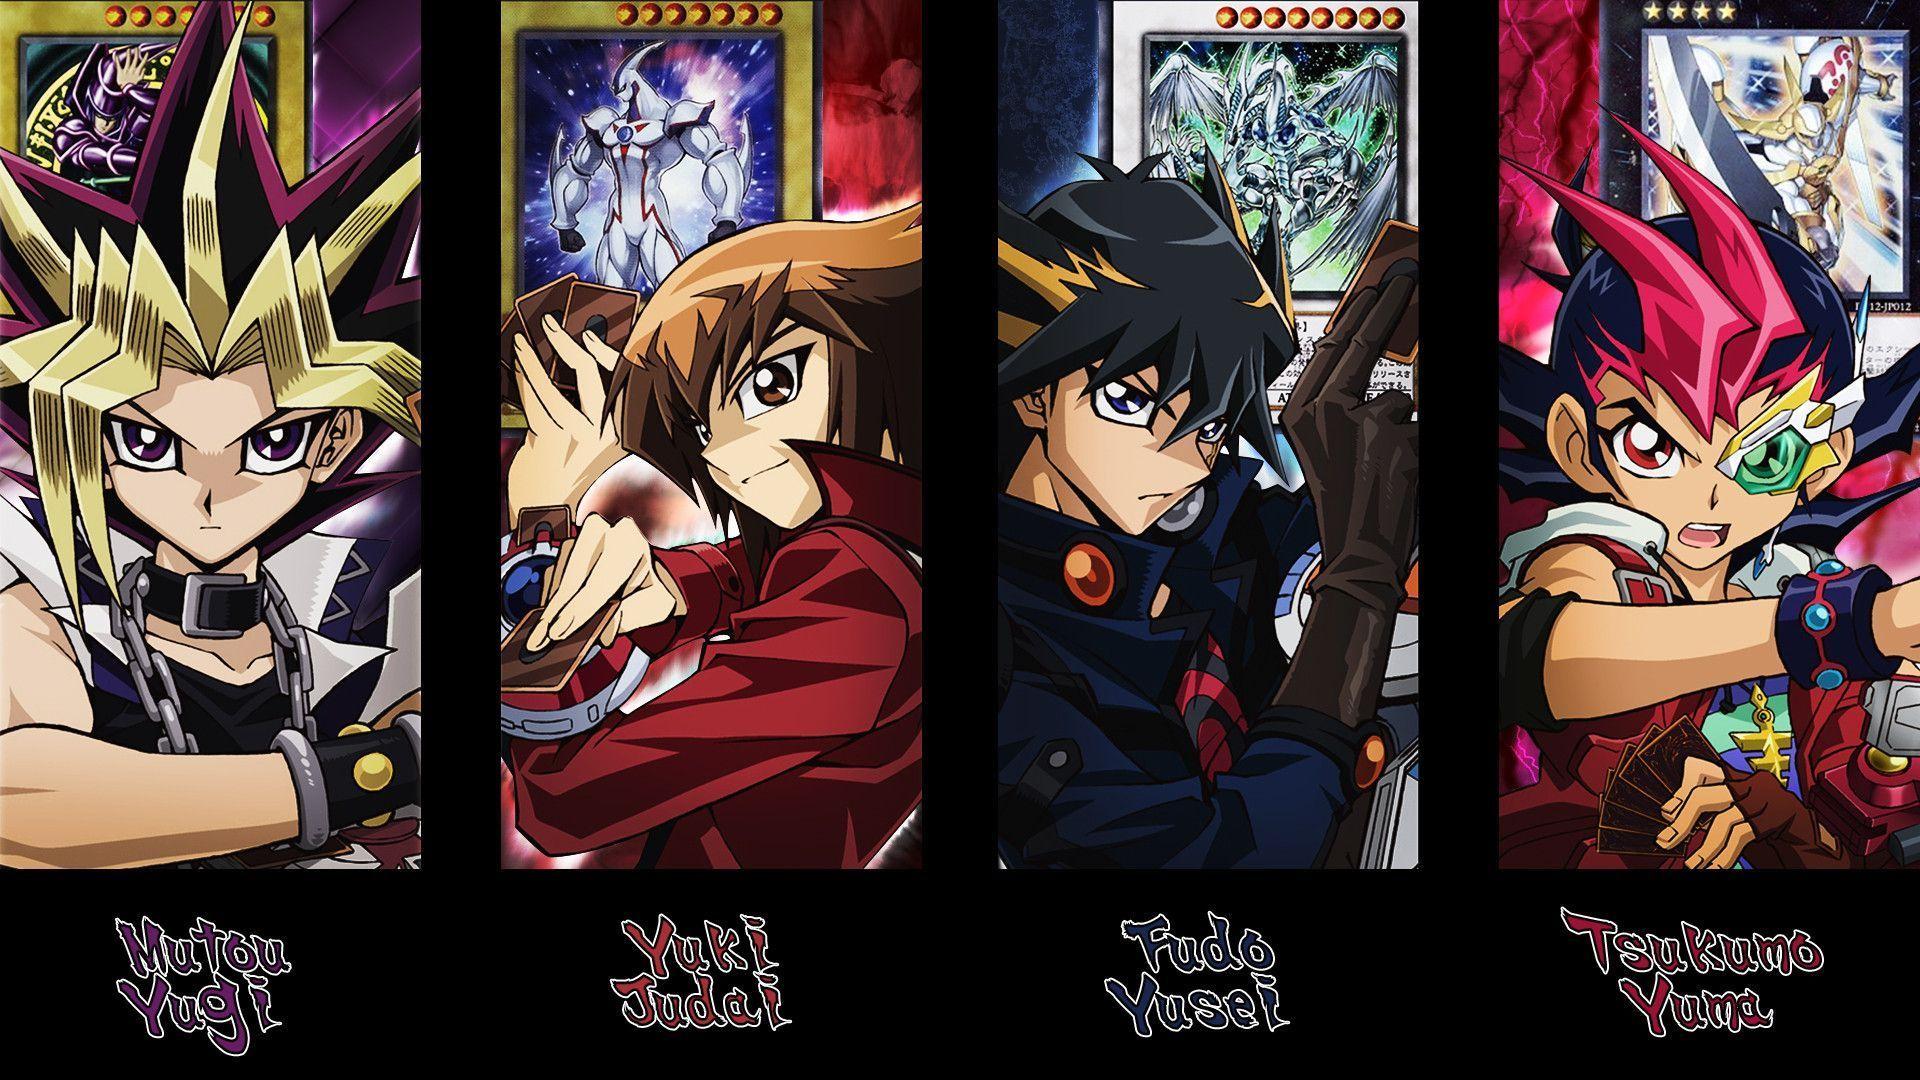 Yugioh Wallpapers 35566 Wallpapers Hd Colourinwallpaper Art Anime Yugioh